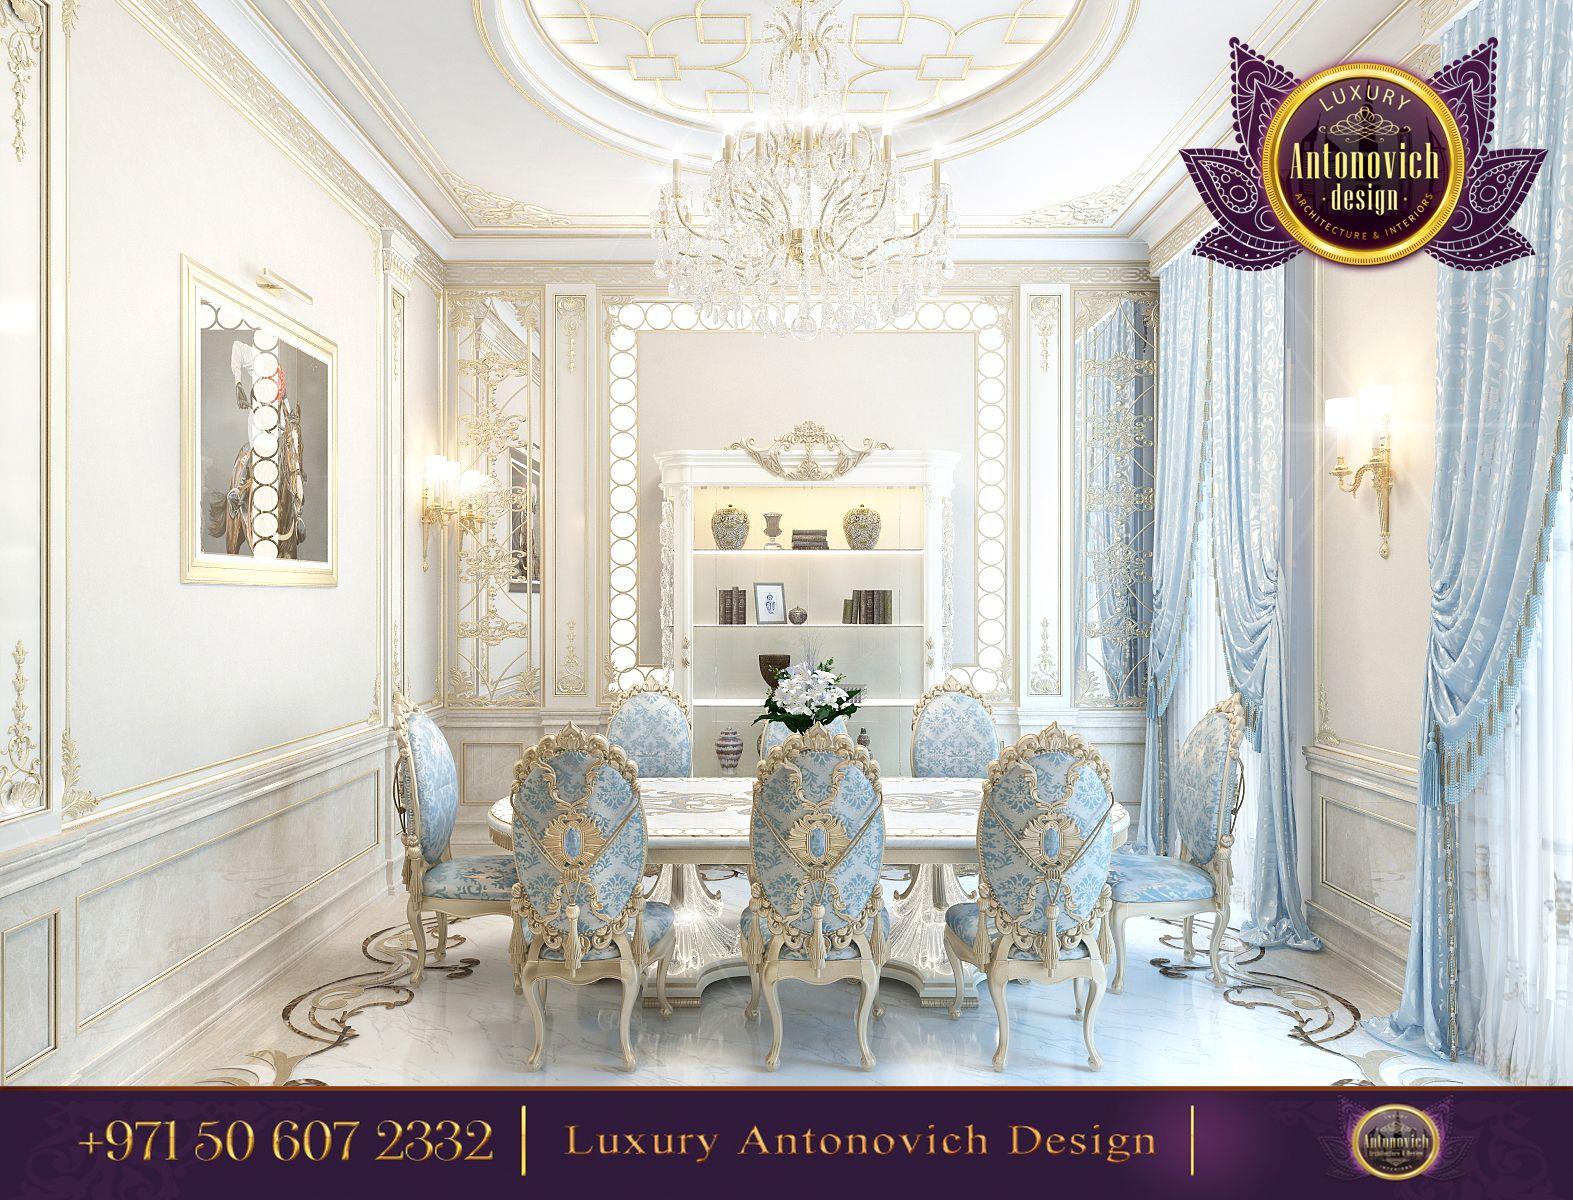 Luxury dining room design antonovich - Interior design kitchen dining room ...